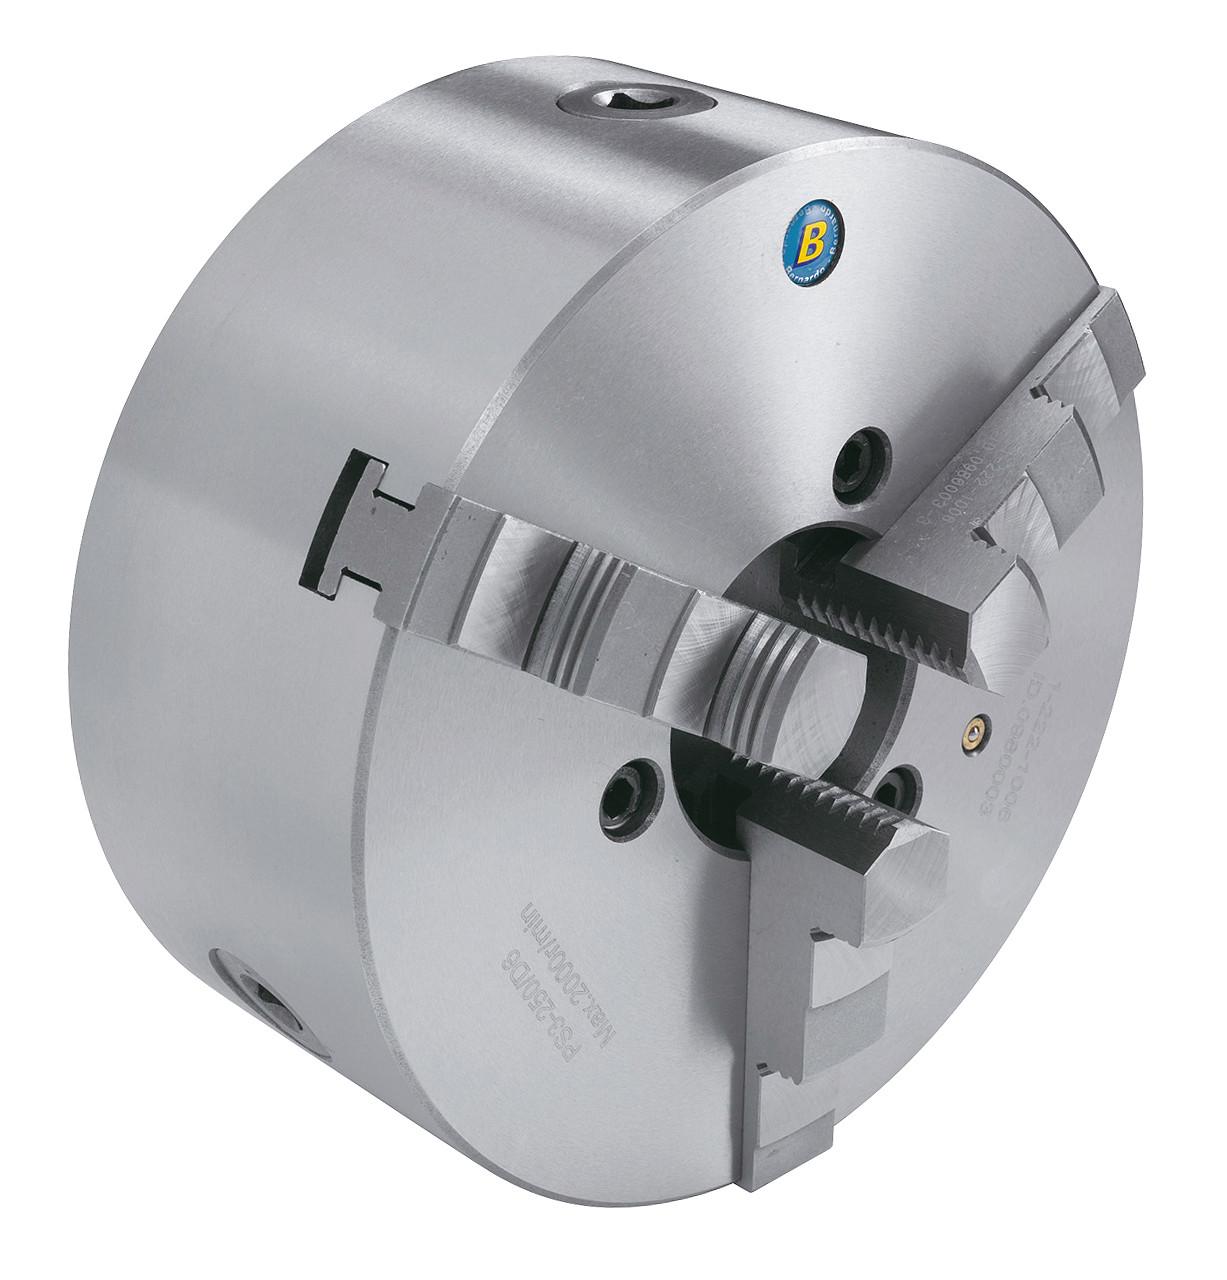 Стандартный 3-челюстный патрон PS3-315/D11